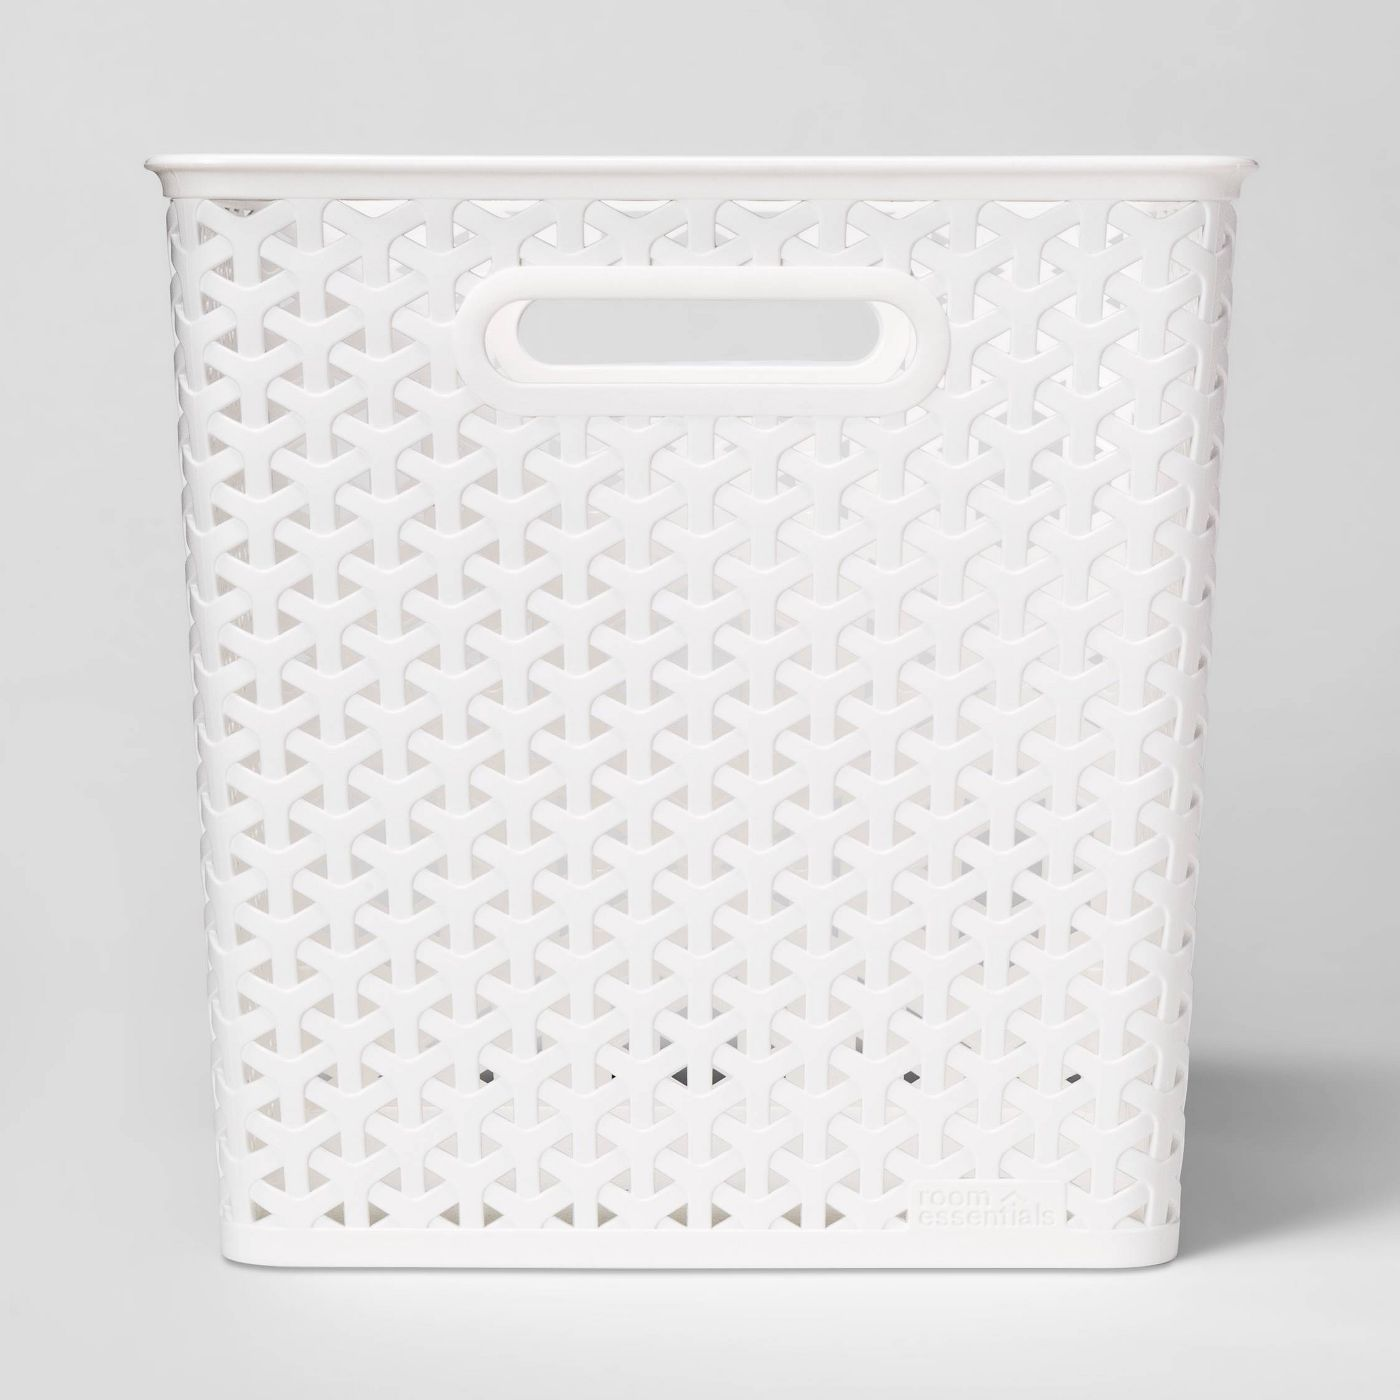 https://www.target.com/p/y-weave-basket-bin-11-room-essentials-153/-/A-52672525